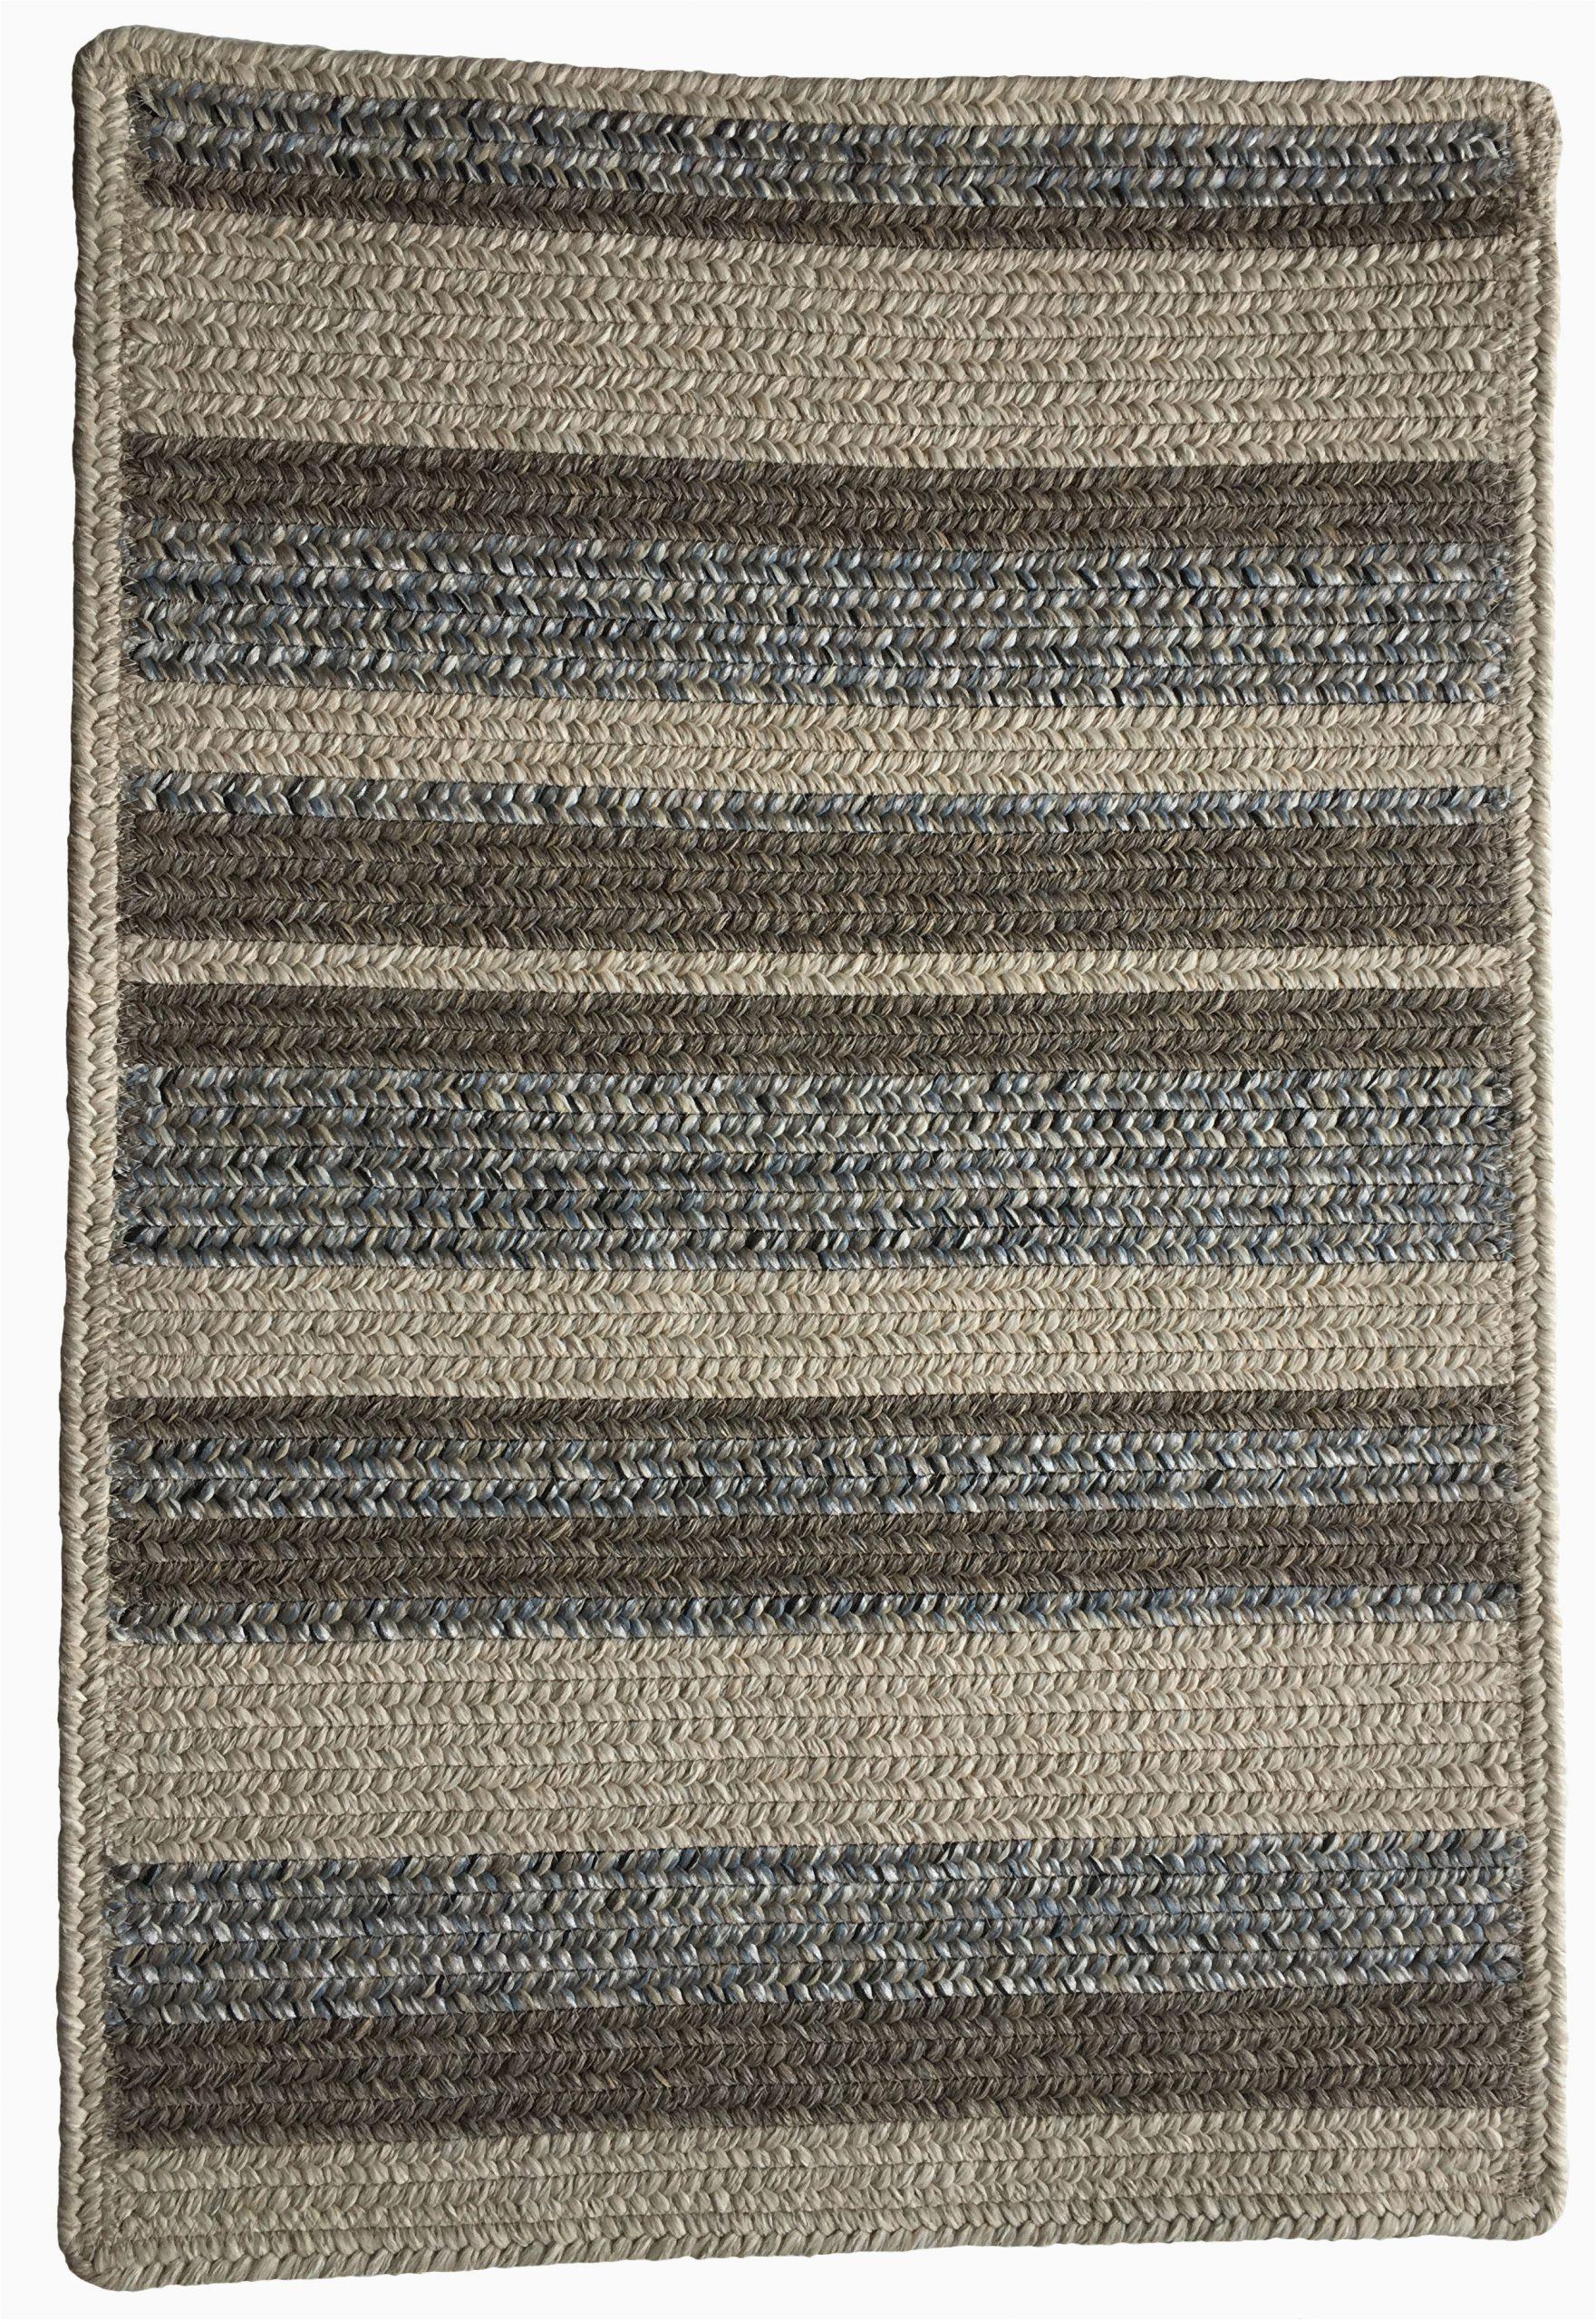 ricardo hand braided beige indooroutdoor area rug